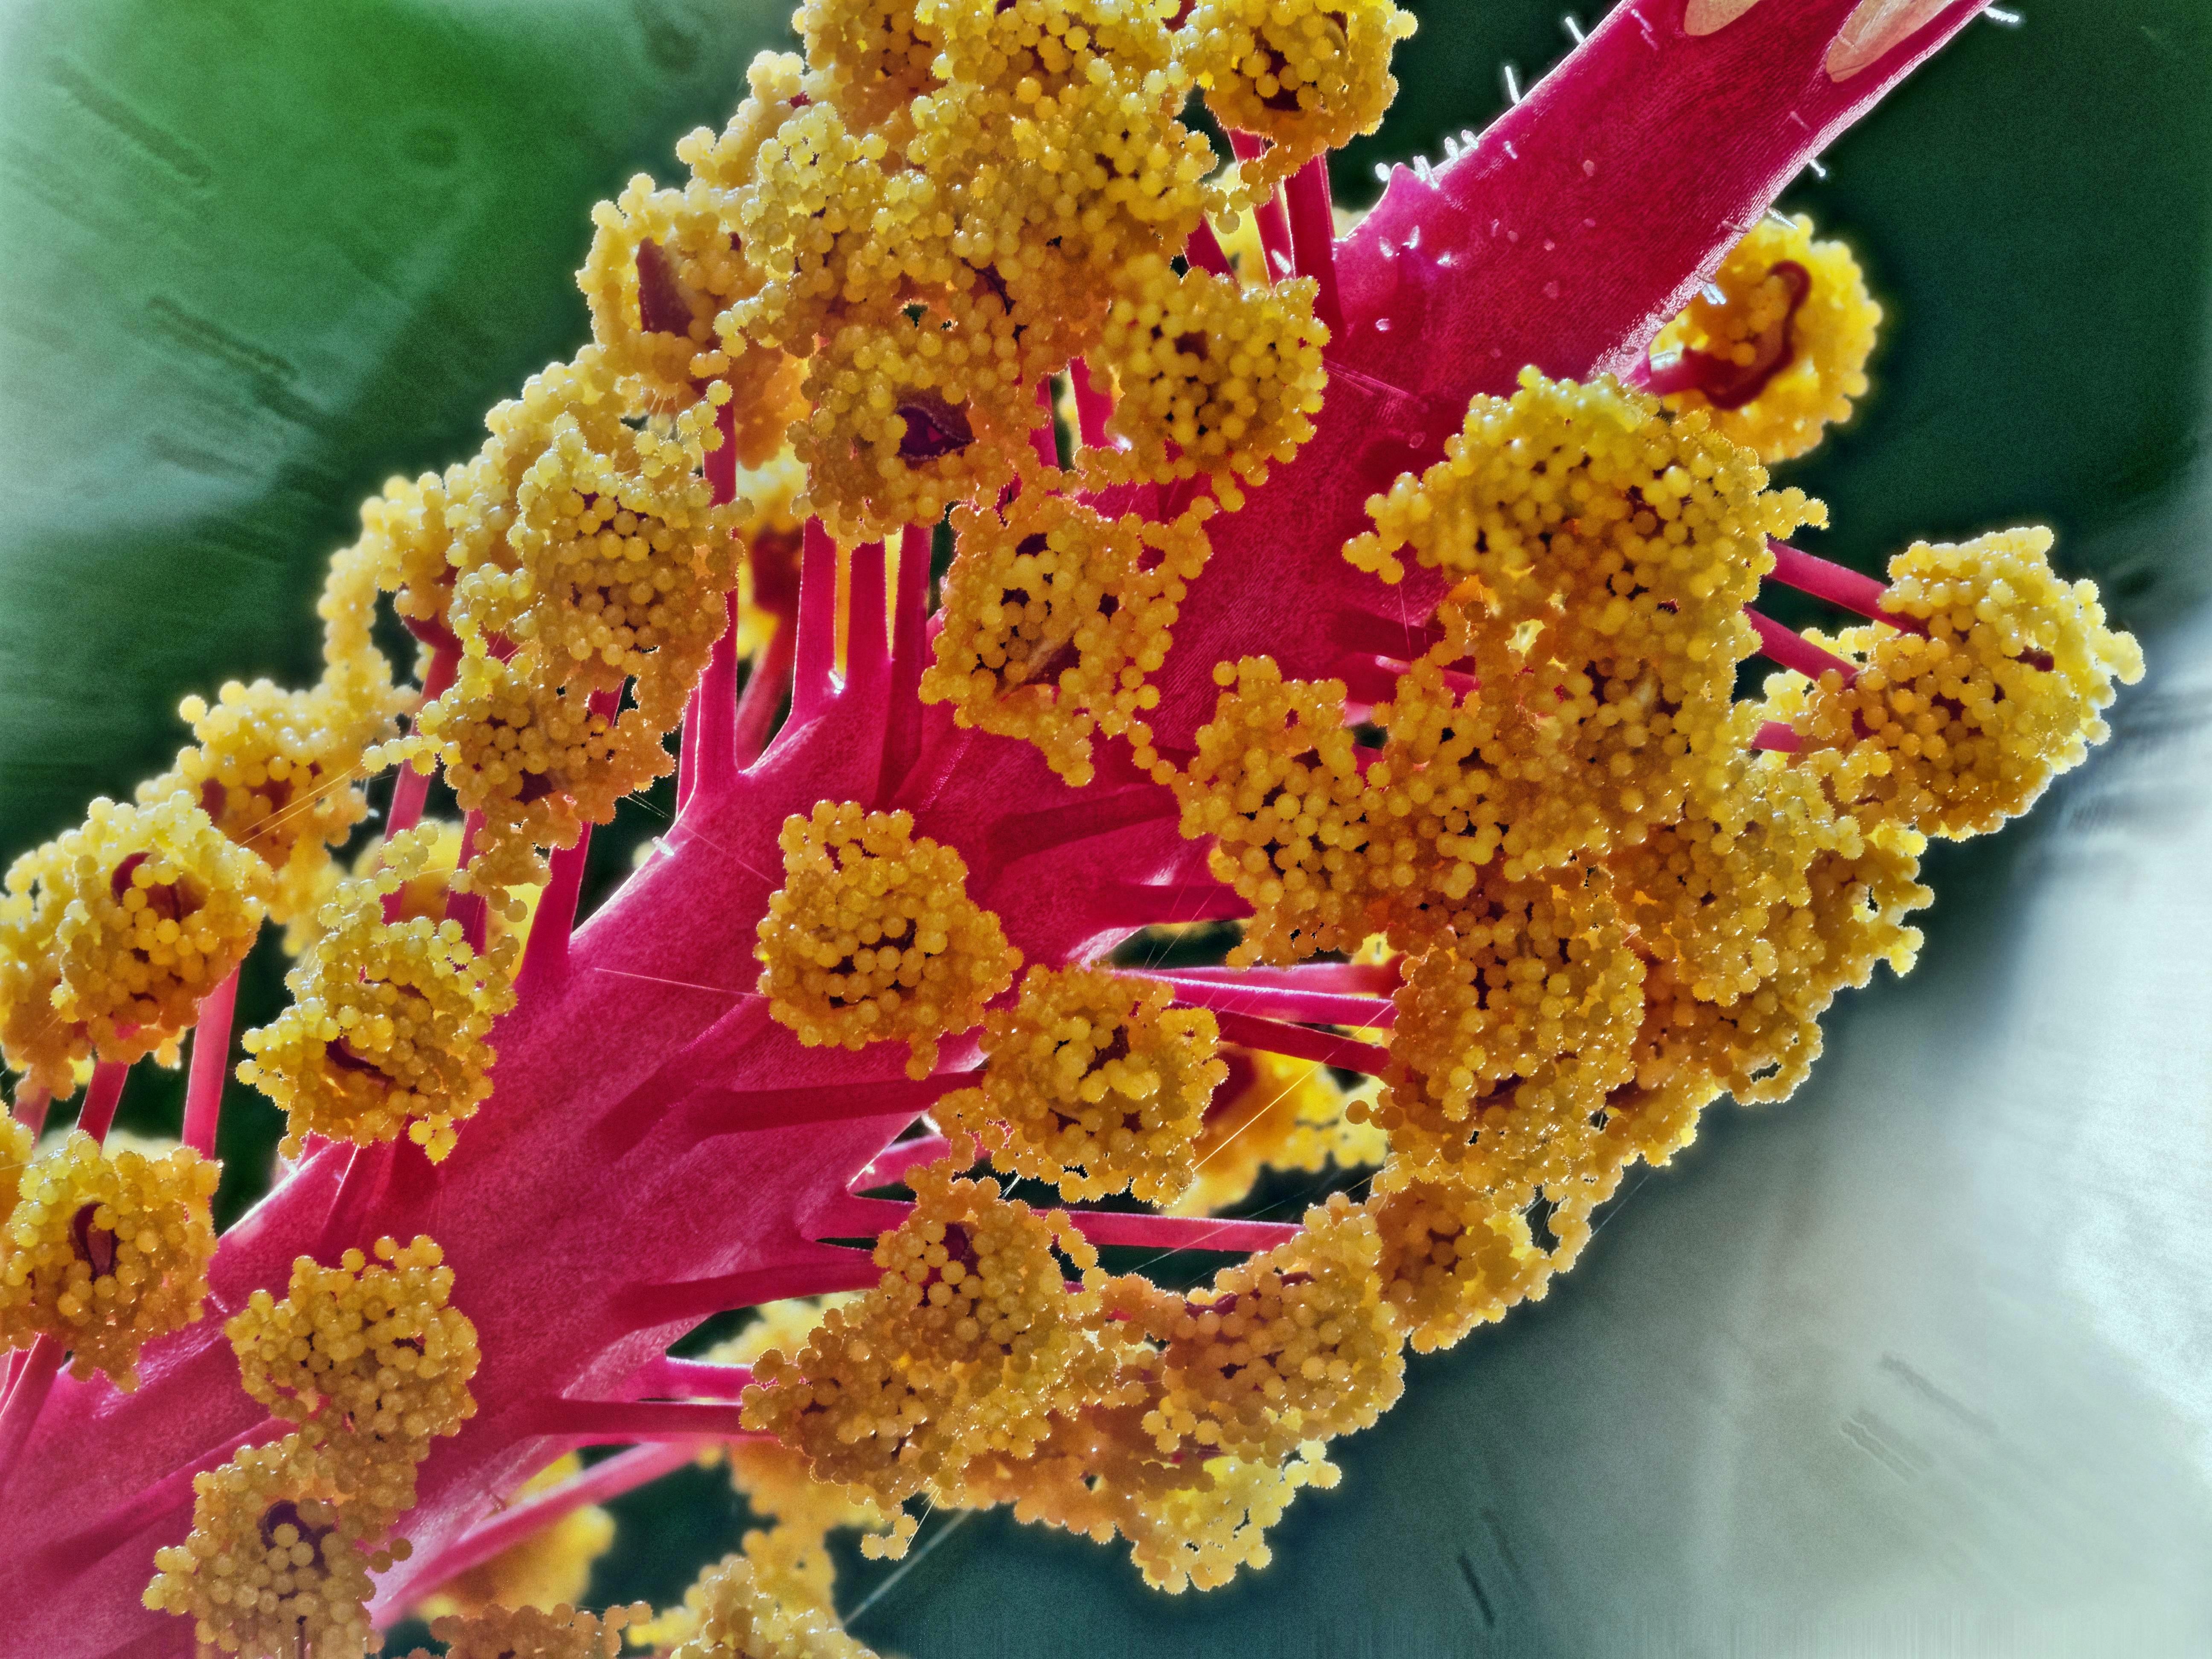 Hibiscus-2-PMax.jpeg